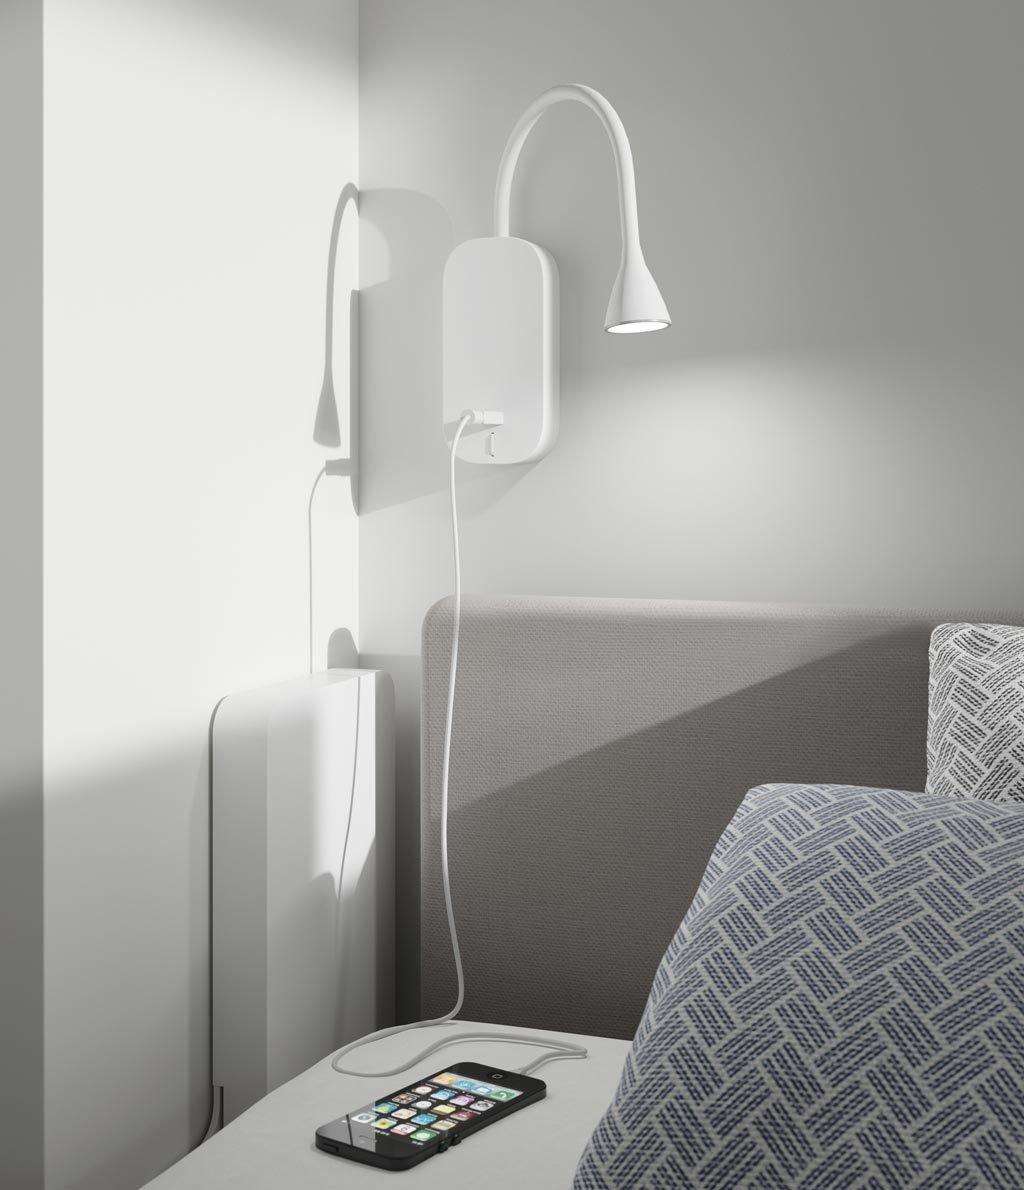 Detalle de la luz Led articulada con cargador USB incorporado